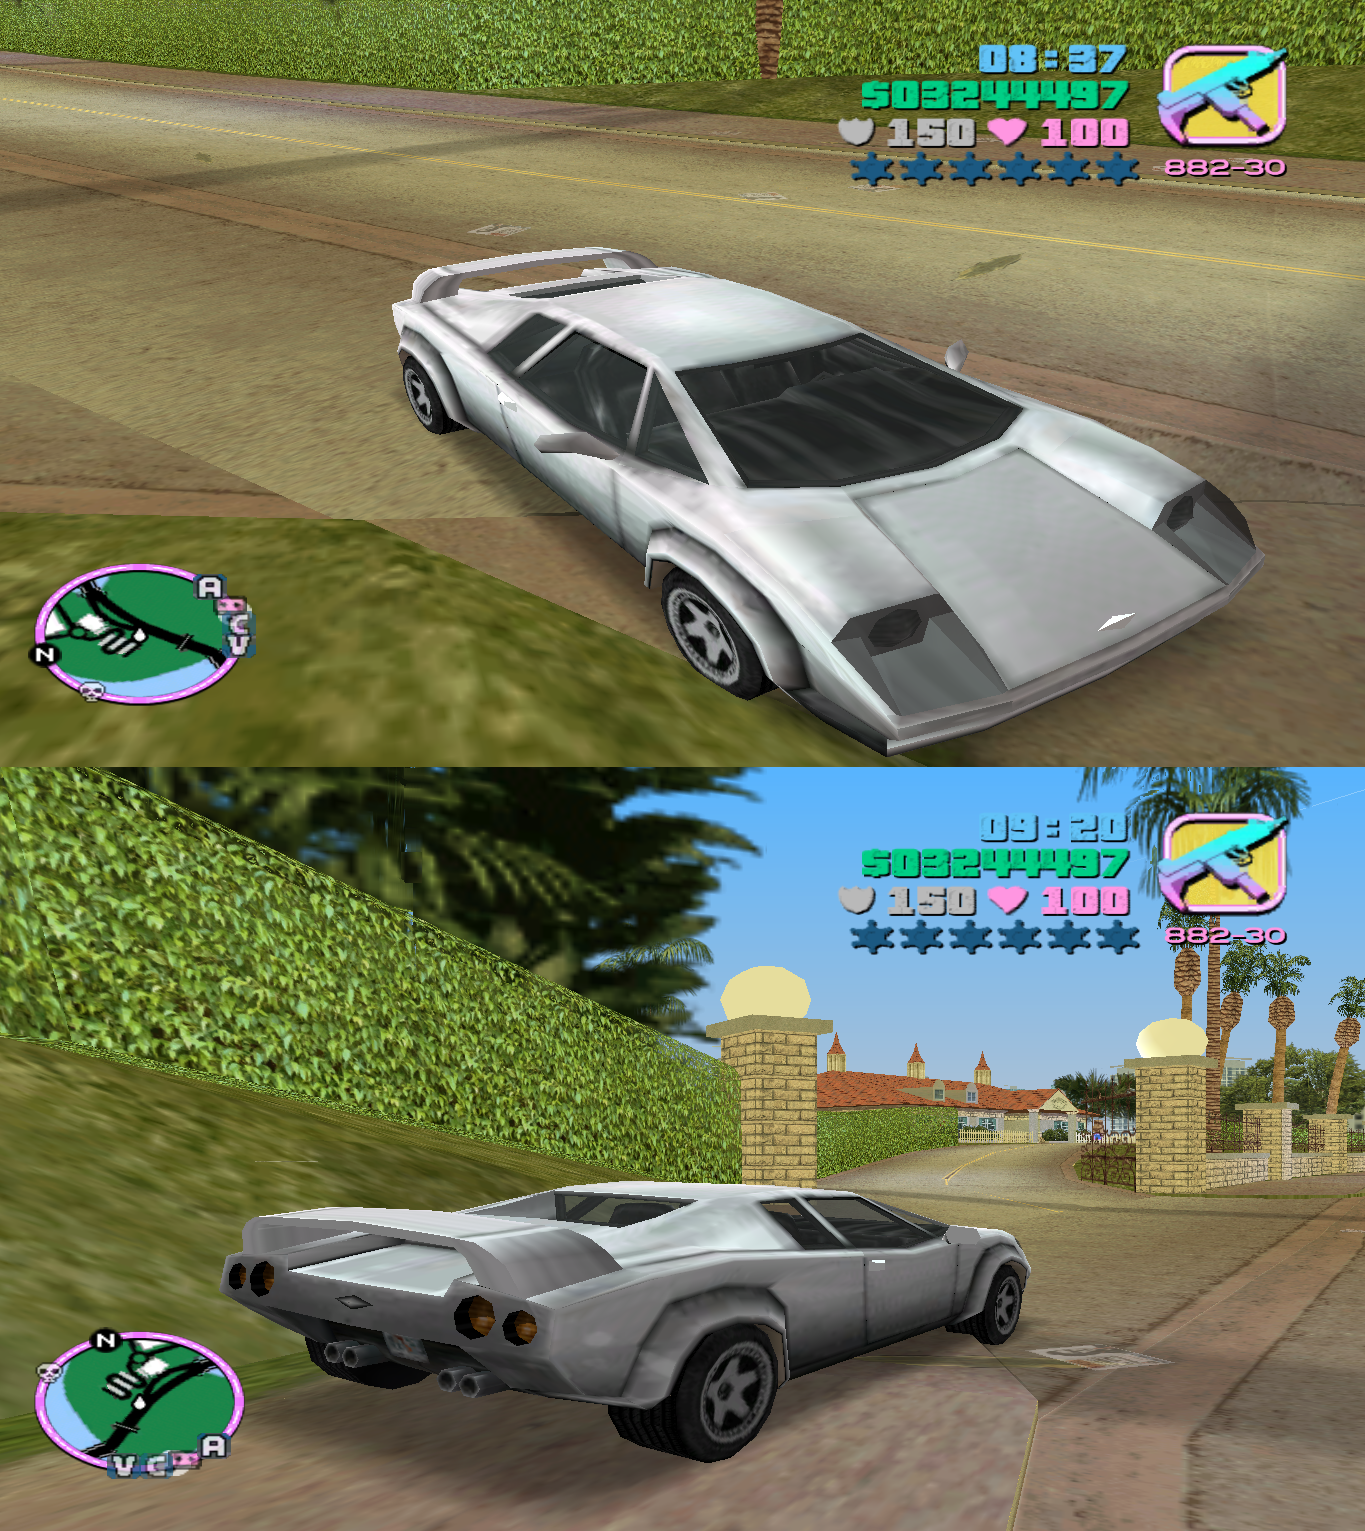 Gta Vice City Cars Infernus Vice City Cars City Car Toy Car